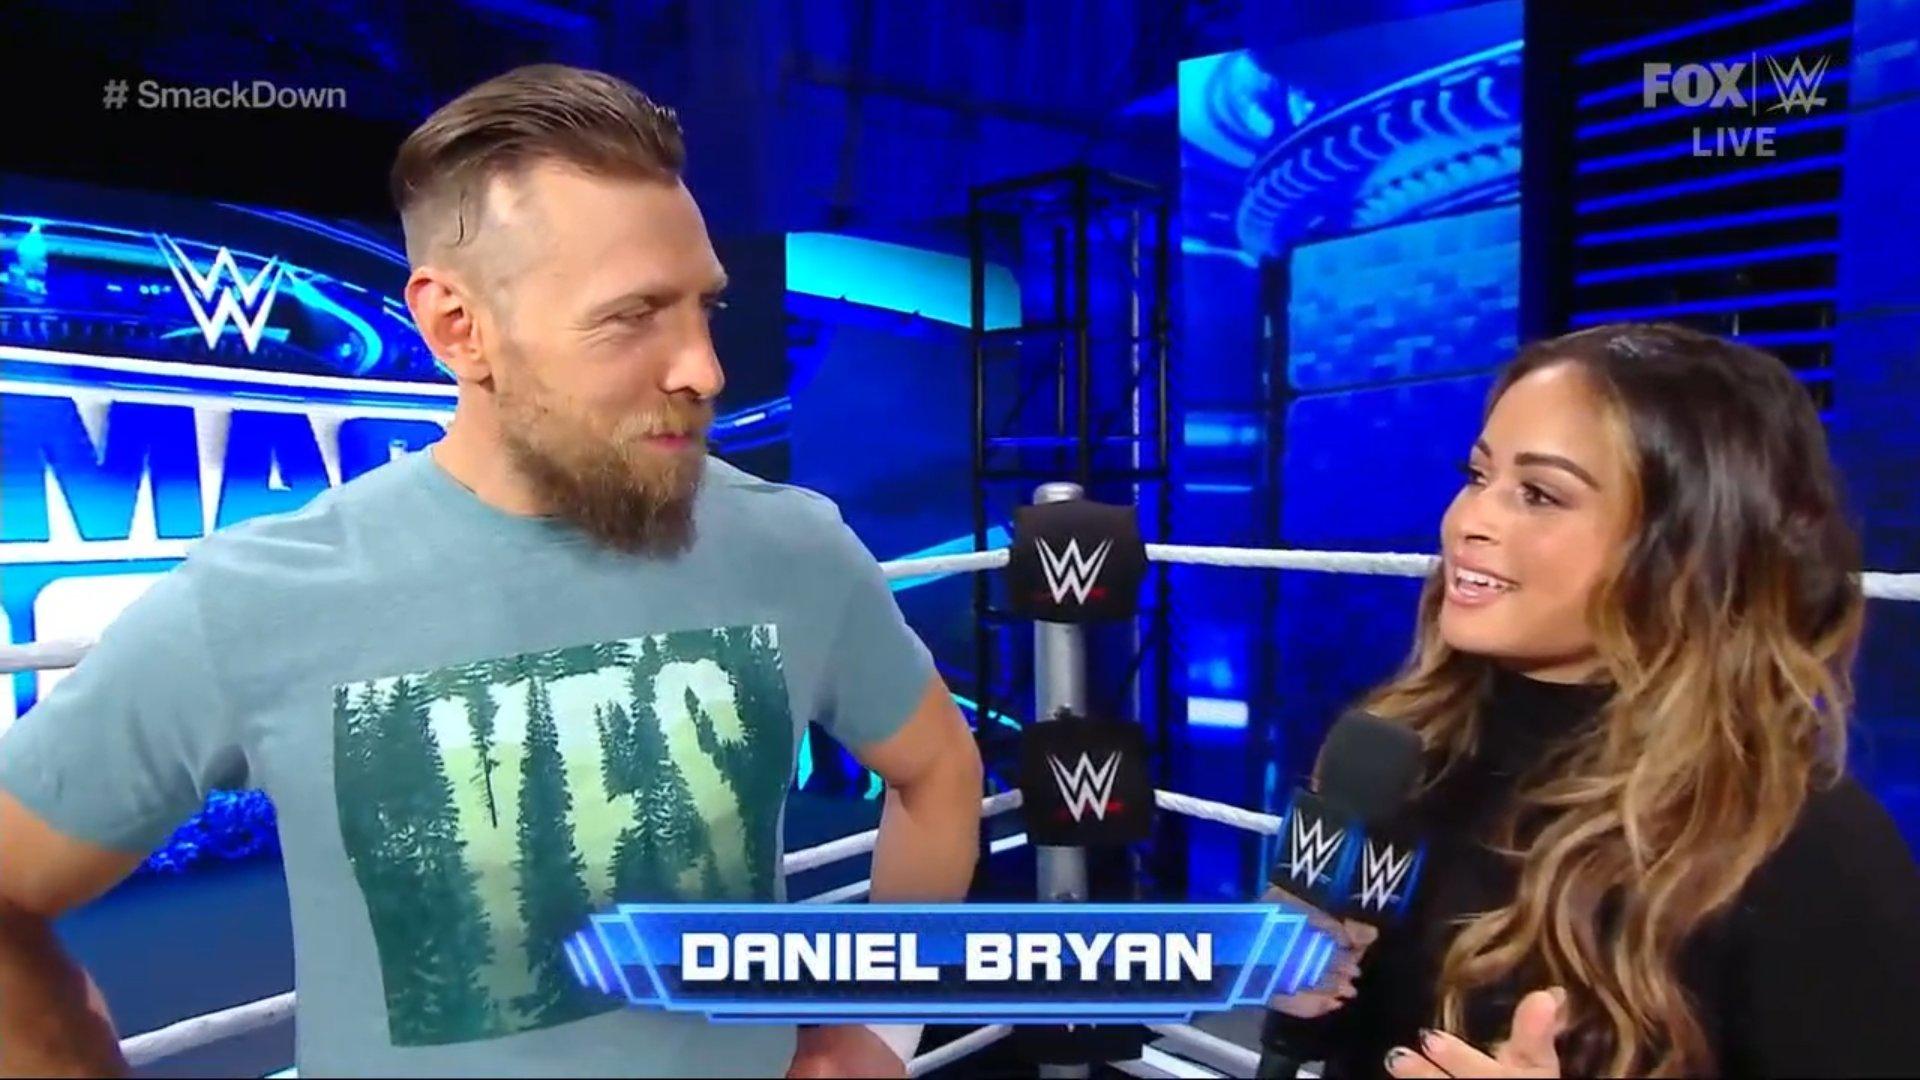 Daniel Bryan is interviewed by Kayla Braxton